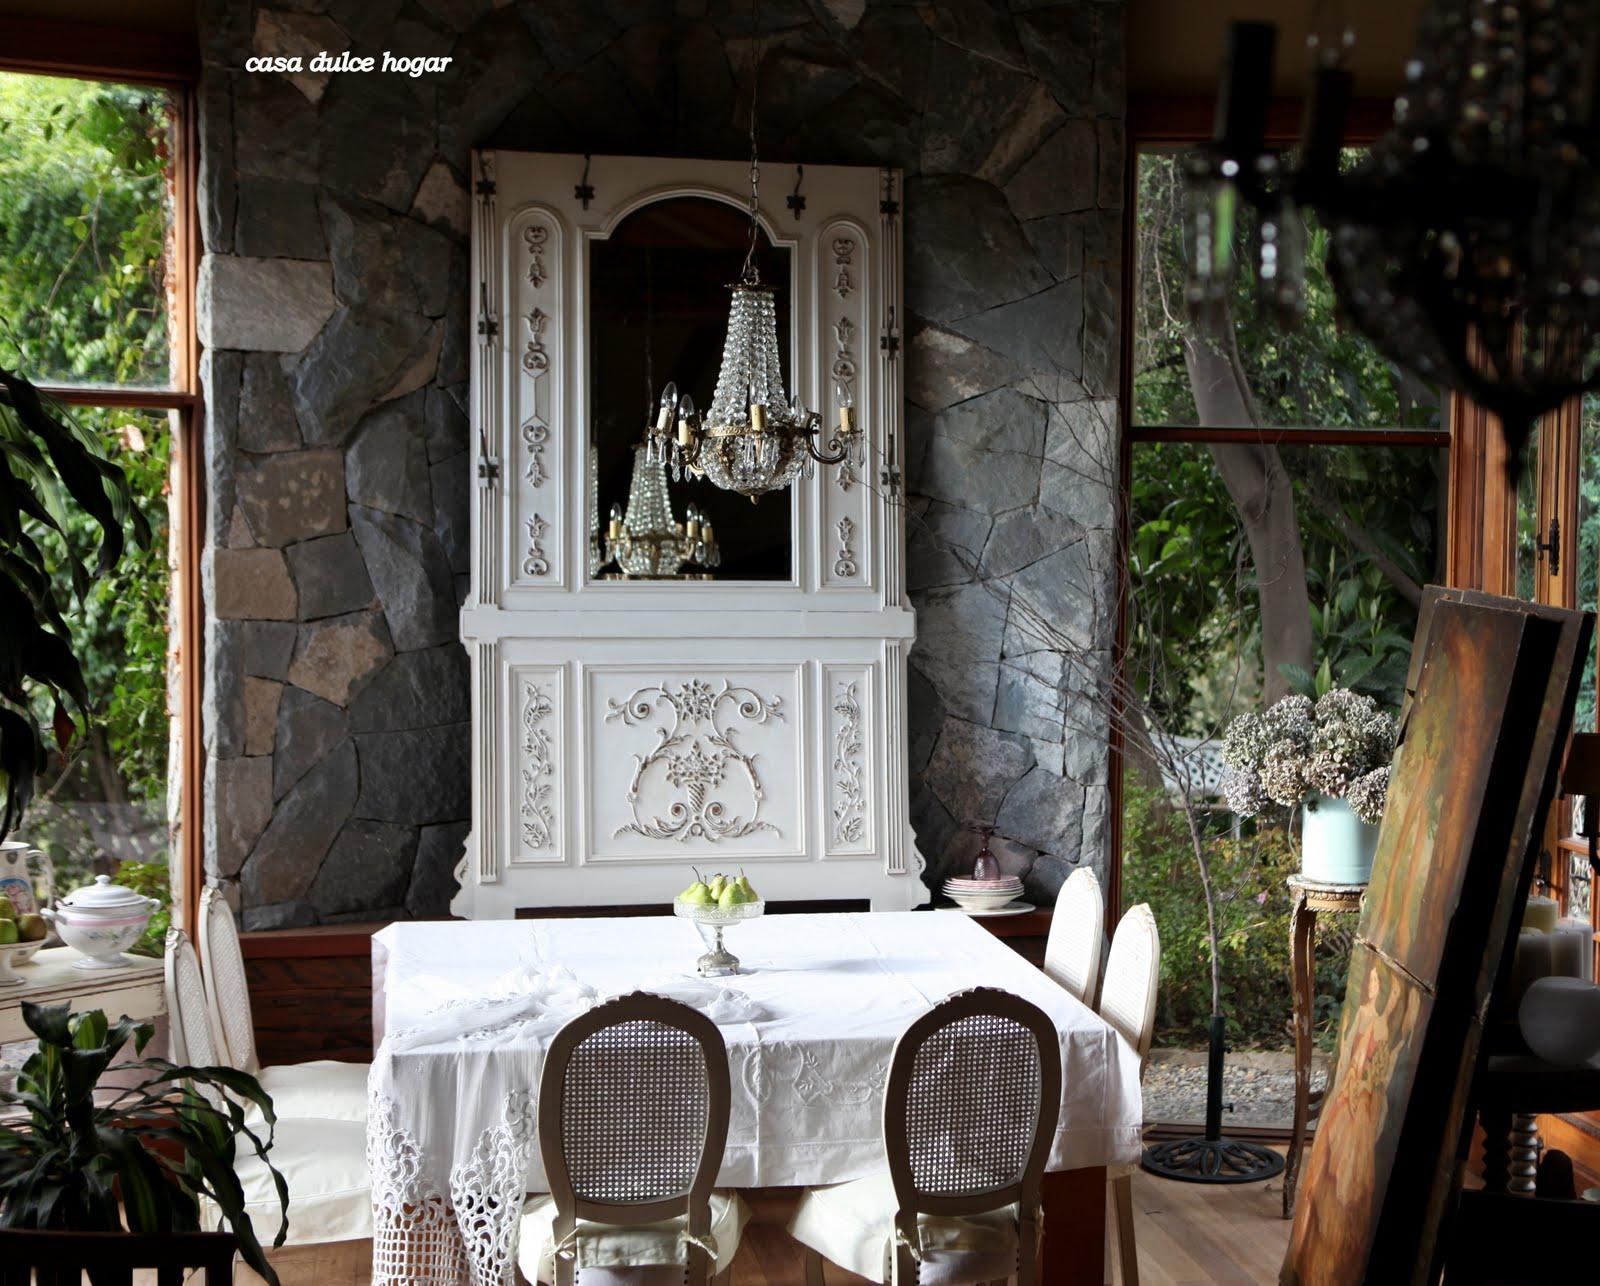 Casa dulce hogar avances en mi comedor for Bar de madera persa bio bio